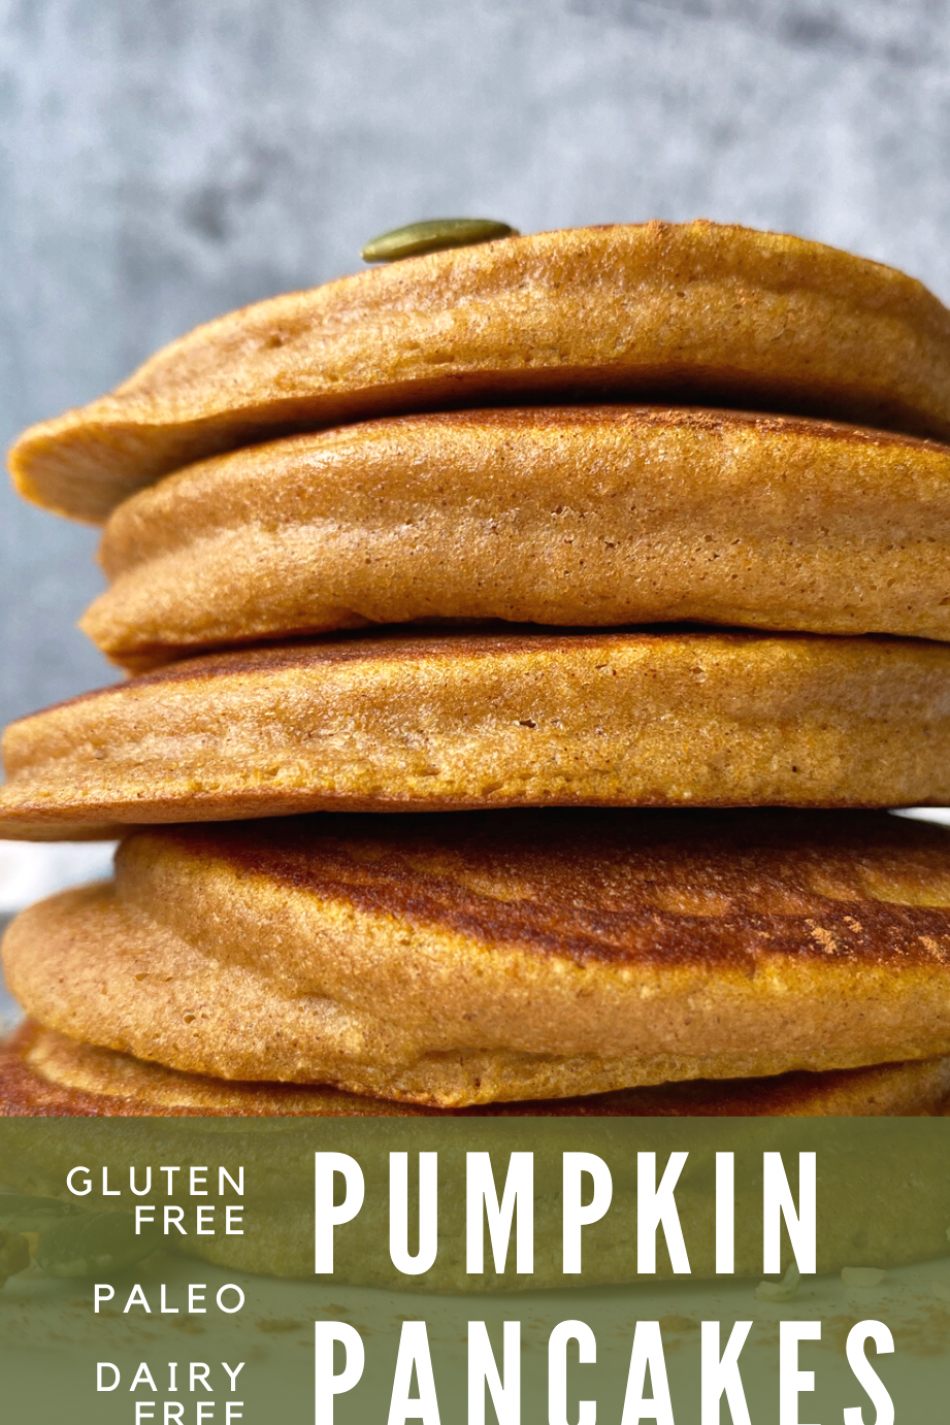 Pumpkin Pancakes (Gluten Free, Dairy Free)